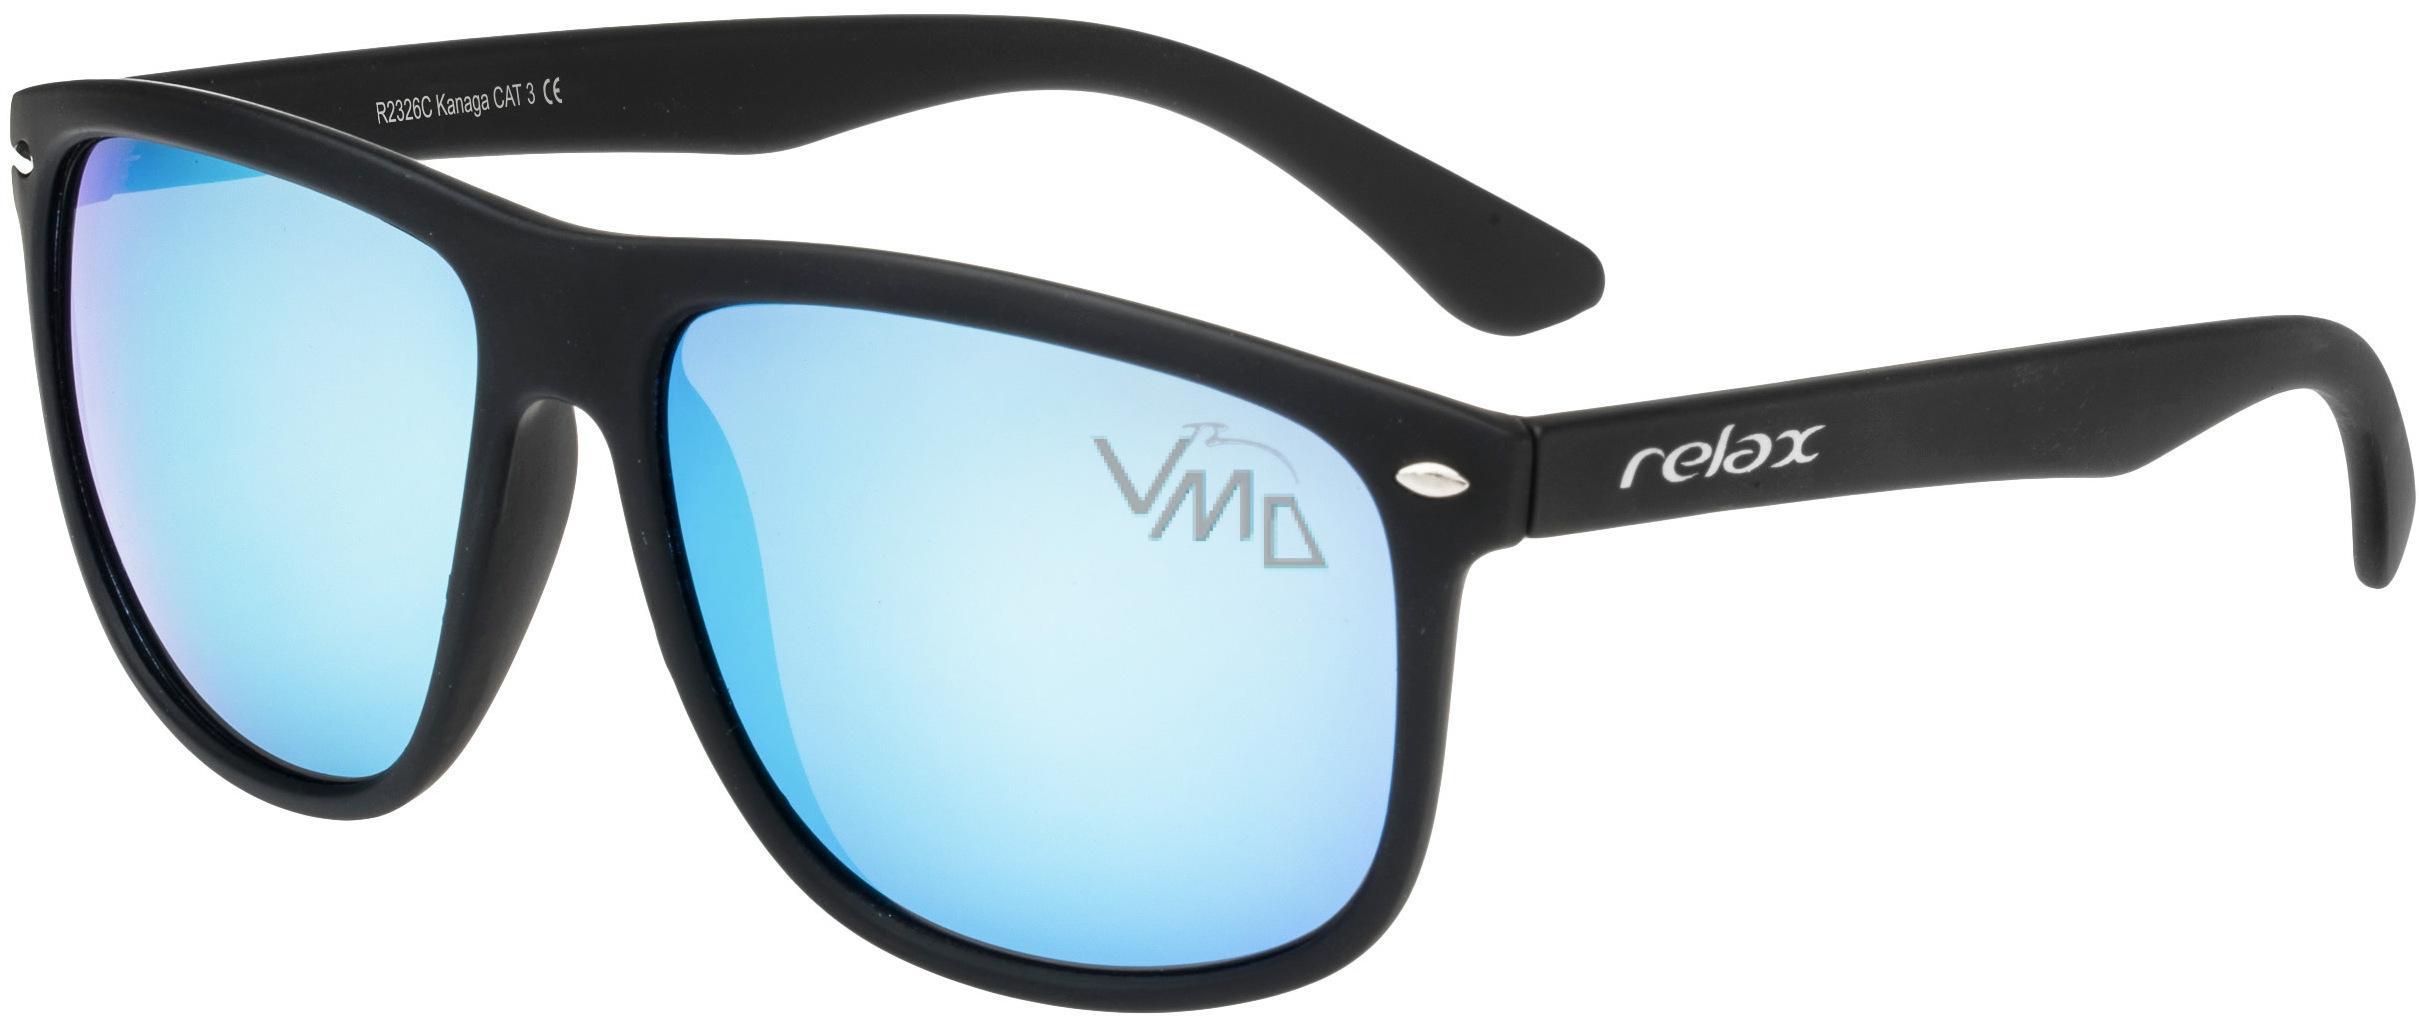 Relax Kanaga Sluneční brýle R2326C - VMD drogerie a3695236157